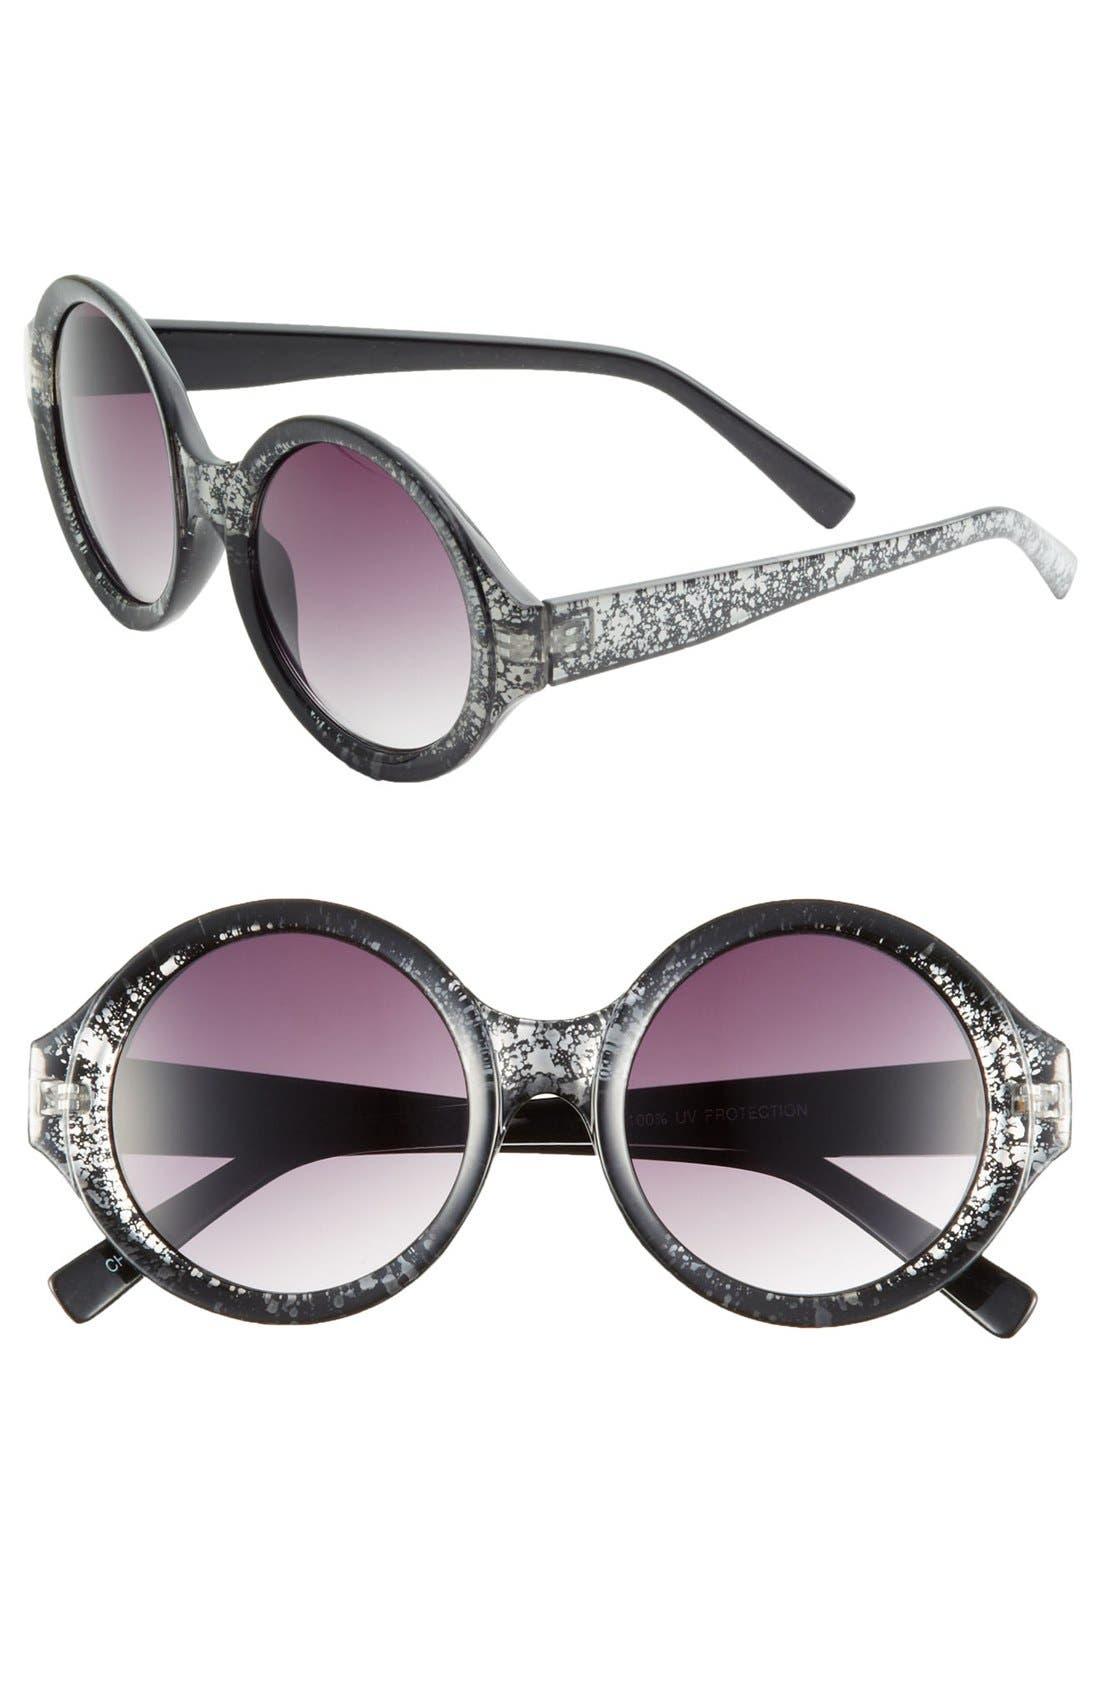 Alternate Image 1 Selected - FE NY 'Crackle' Circle Frame Sunglasses